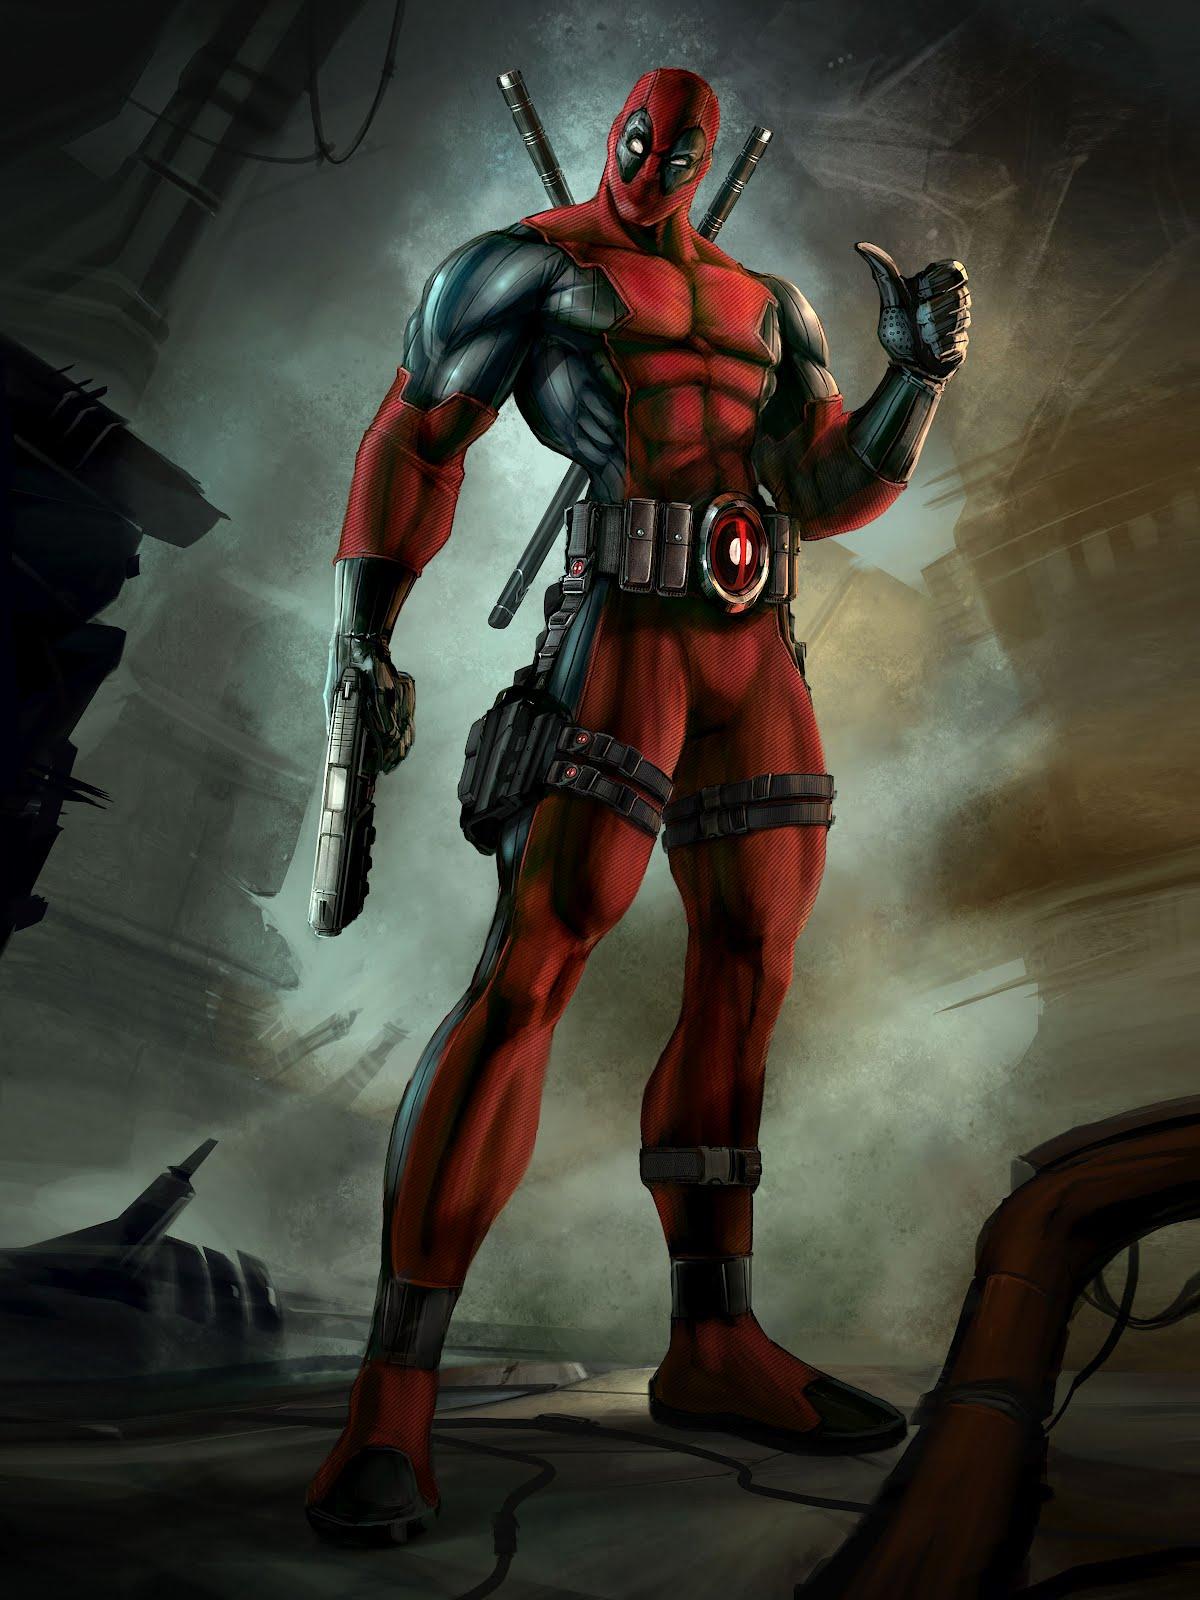 Gamescom 2012: Deadpool Video Game Screen Shots and ...